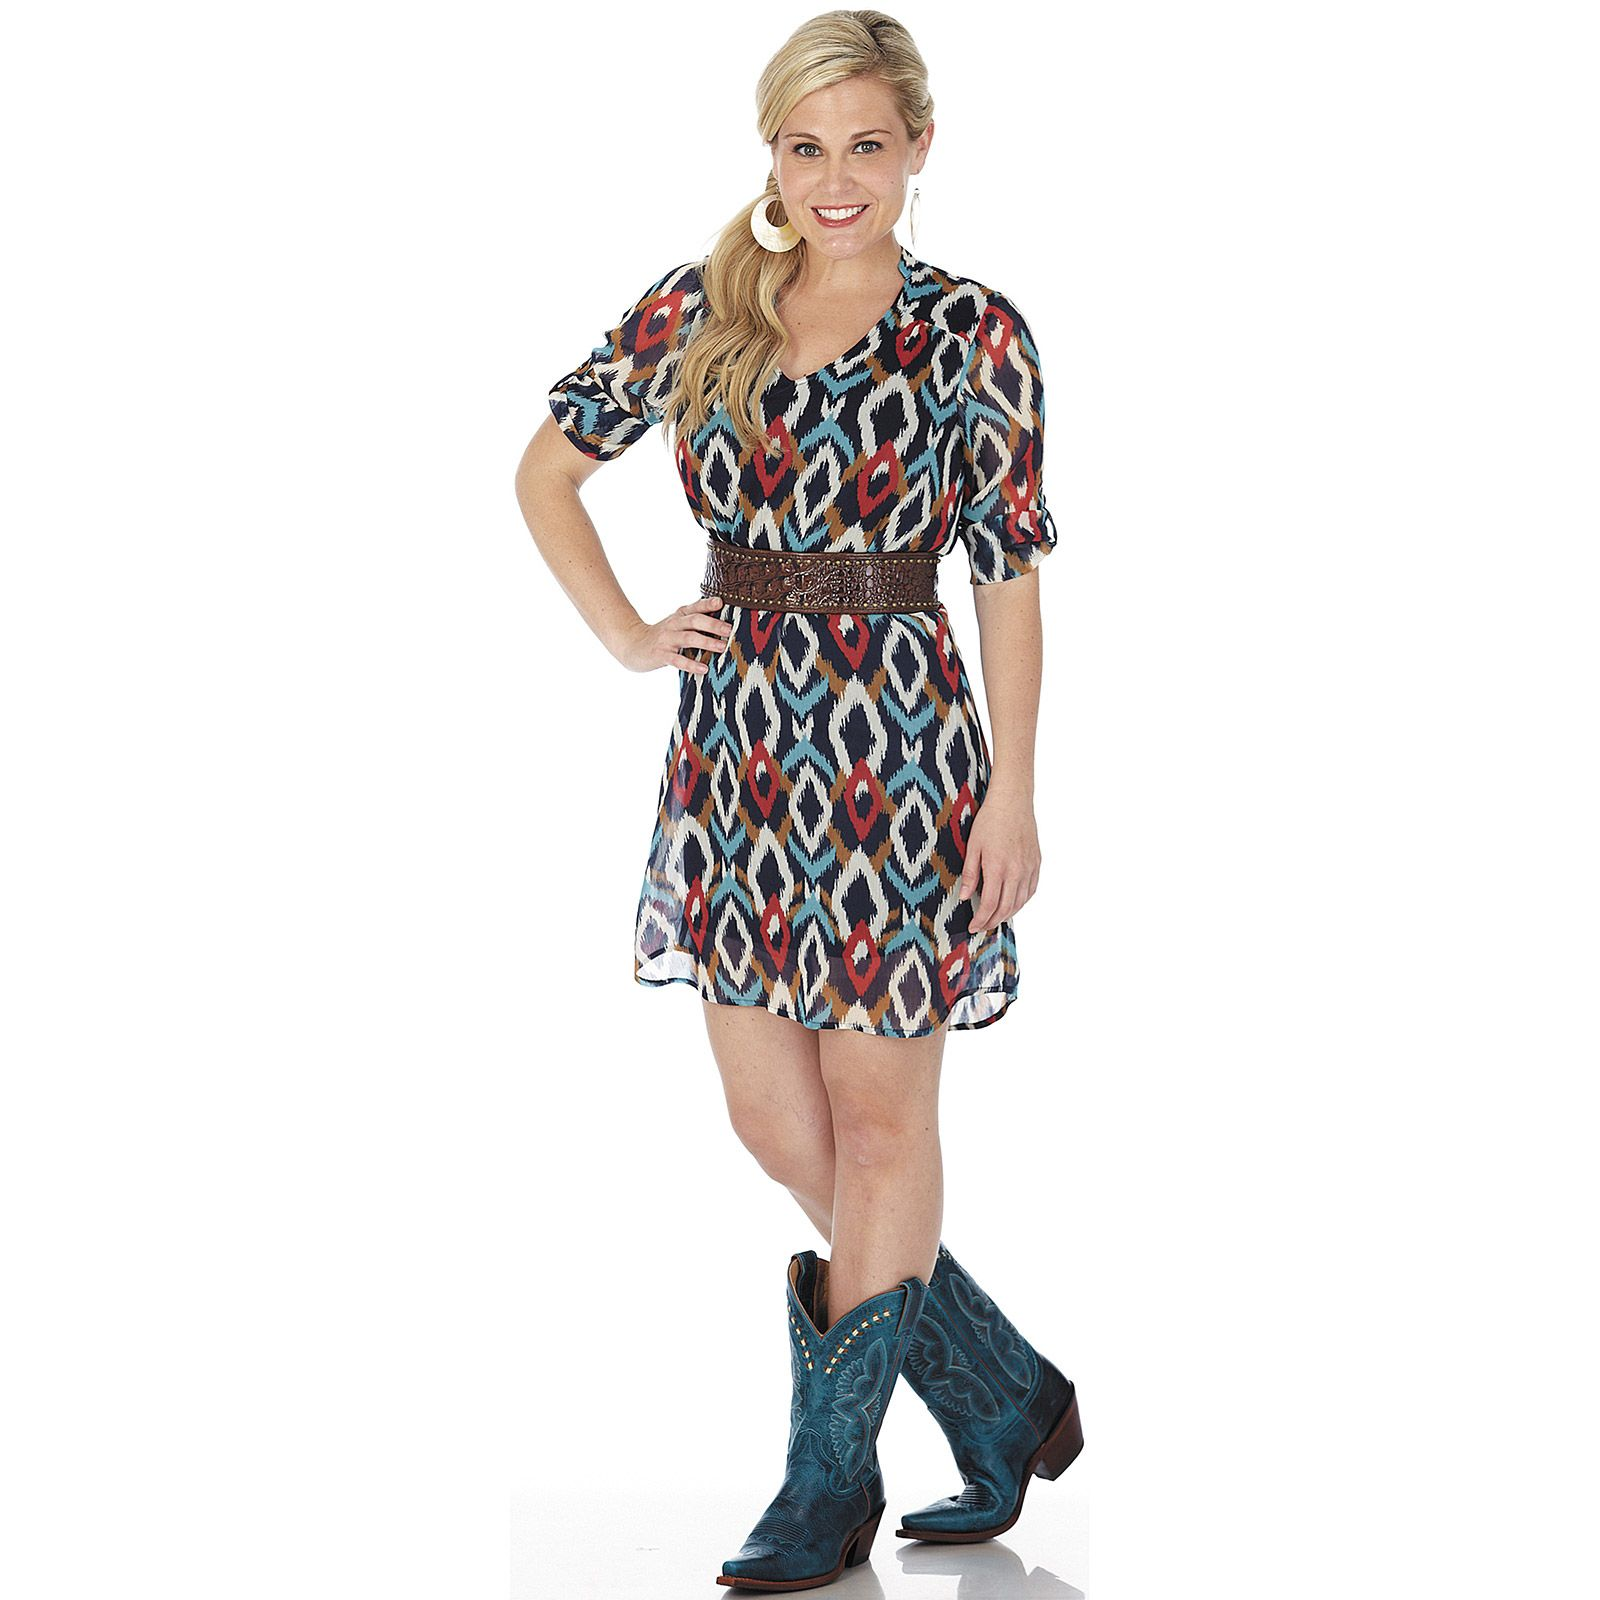 Stay Bright Dress - Rose Gold, Dresses | Fashion Nova